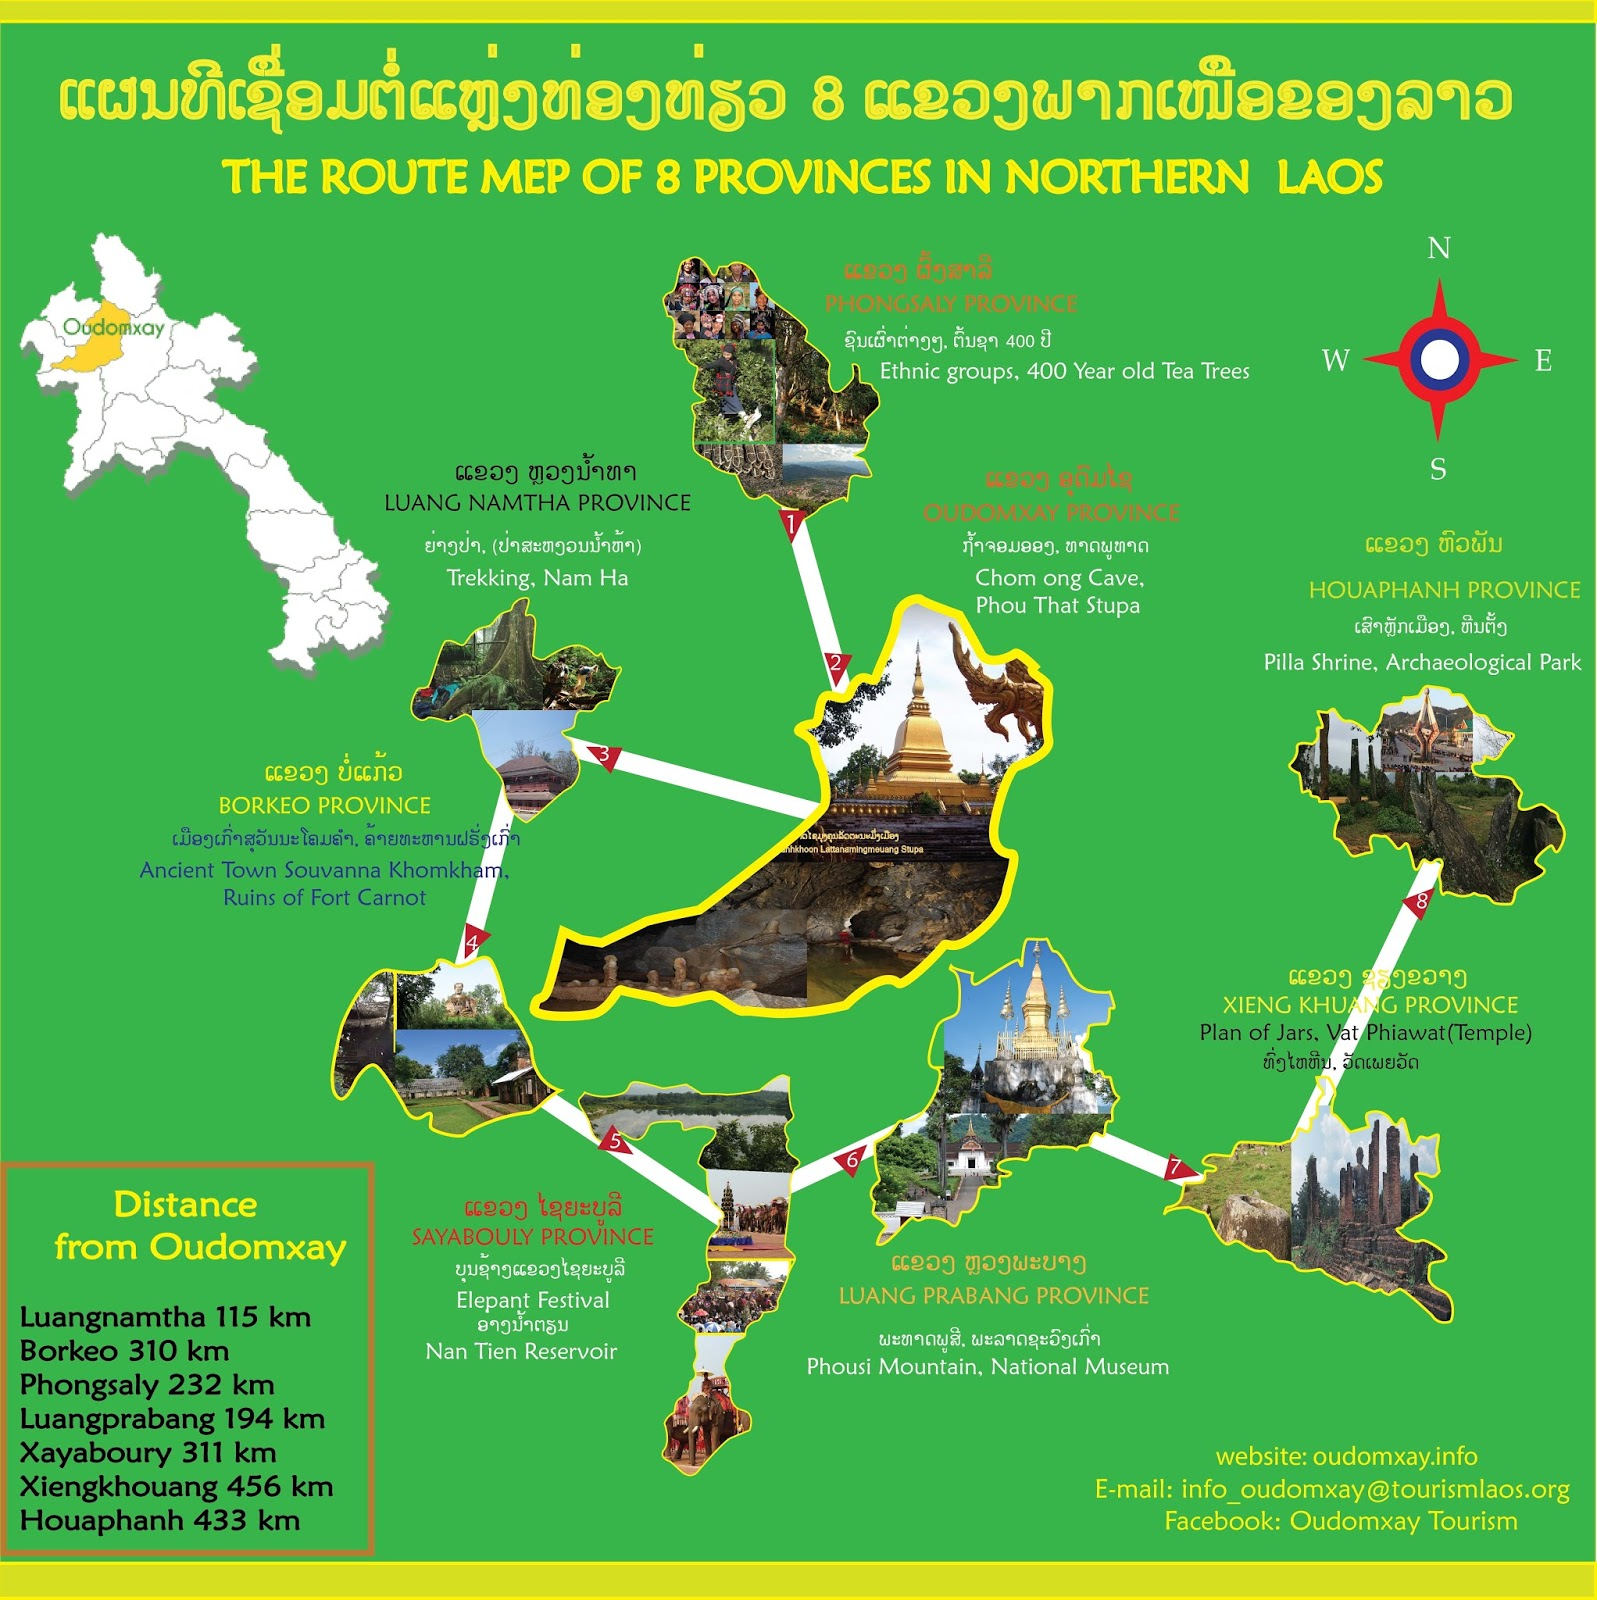 Oudomxay Tourism MAPS